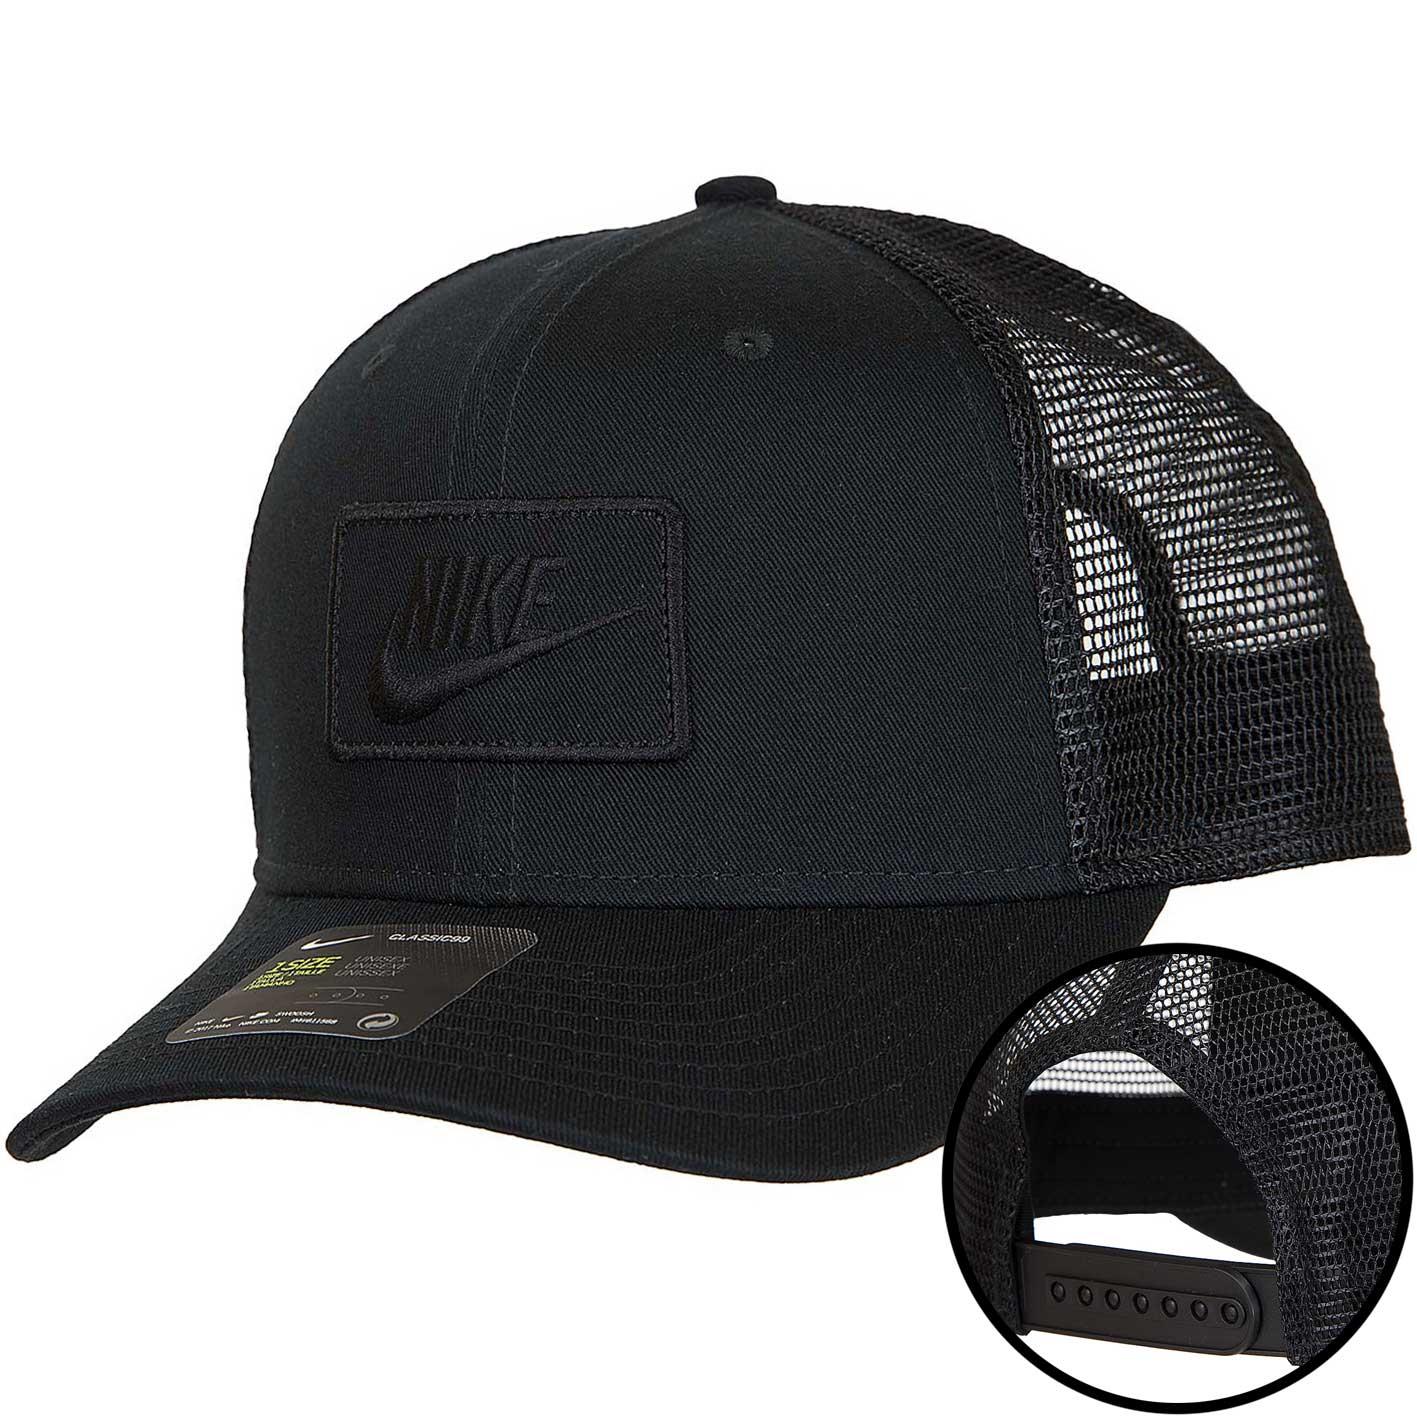 6f40801930657 ☆ Nike Trucker Cap Classic99 schwarz - hier bestellen!